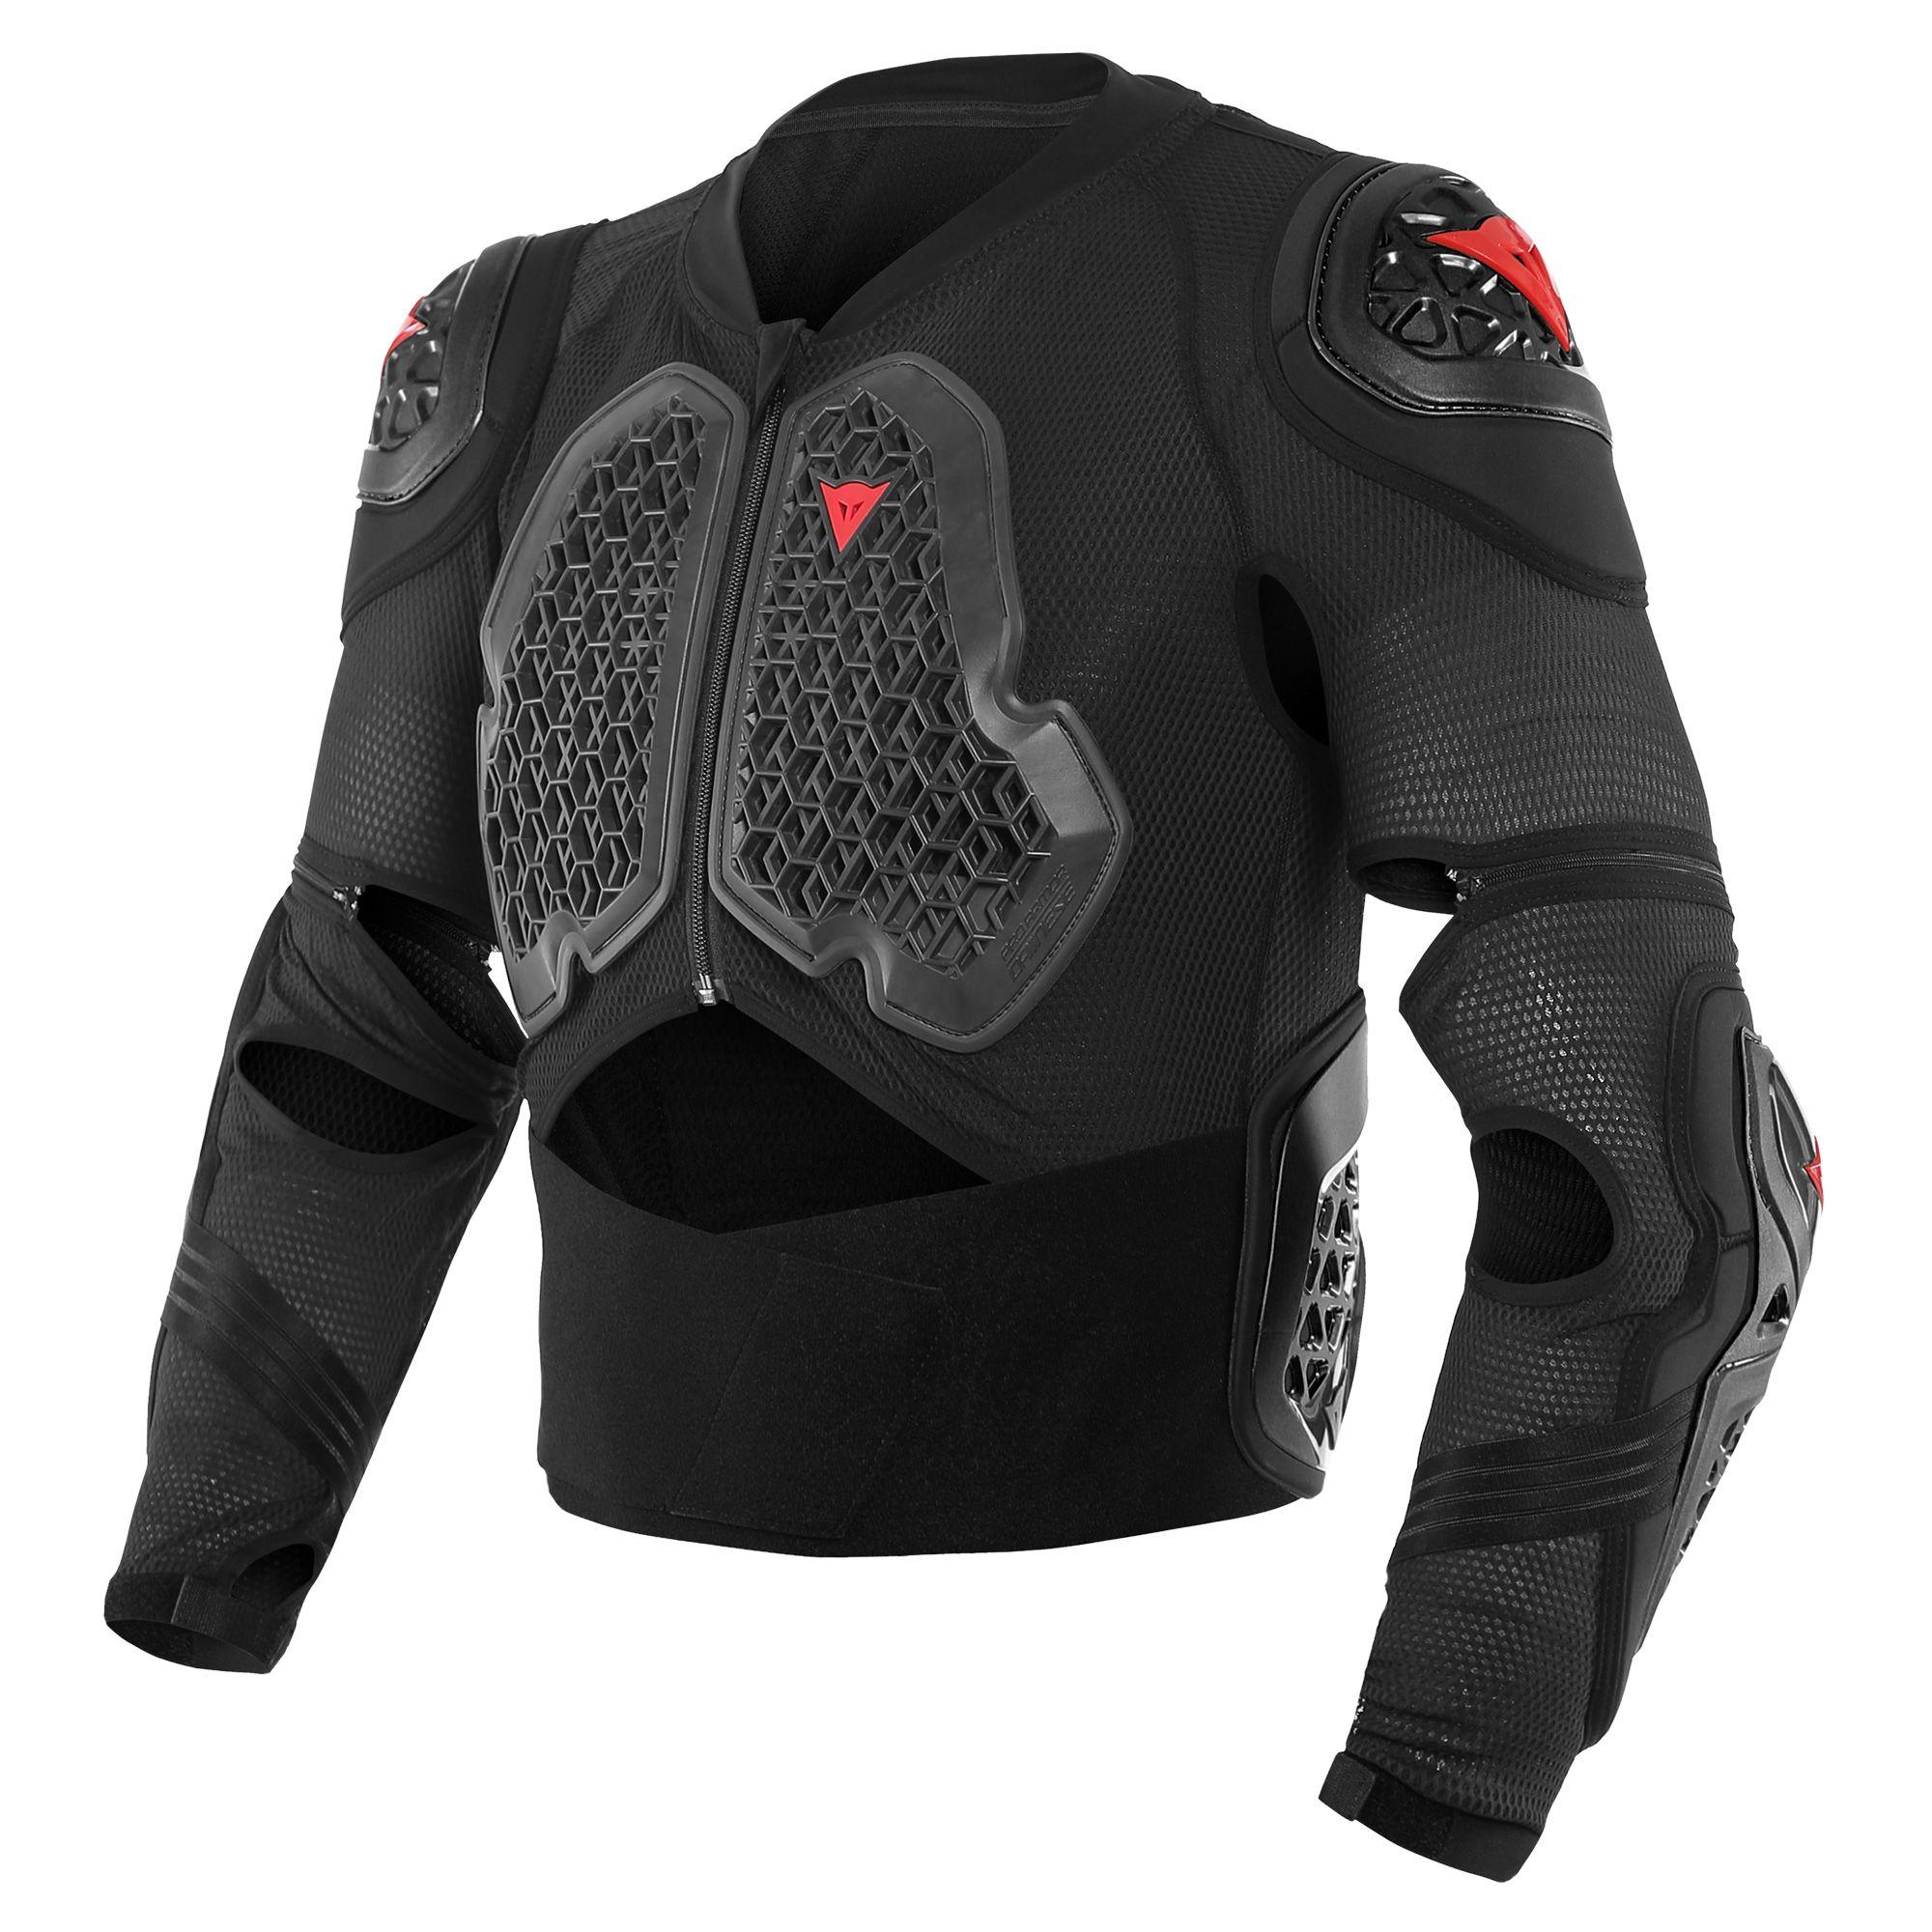 Dainese MX1 Safety Jacket Body Armour